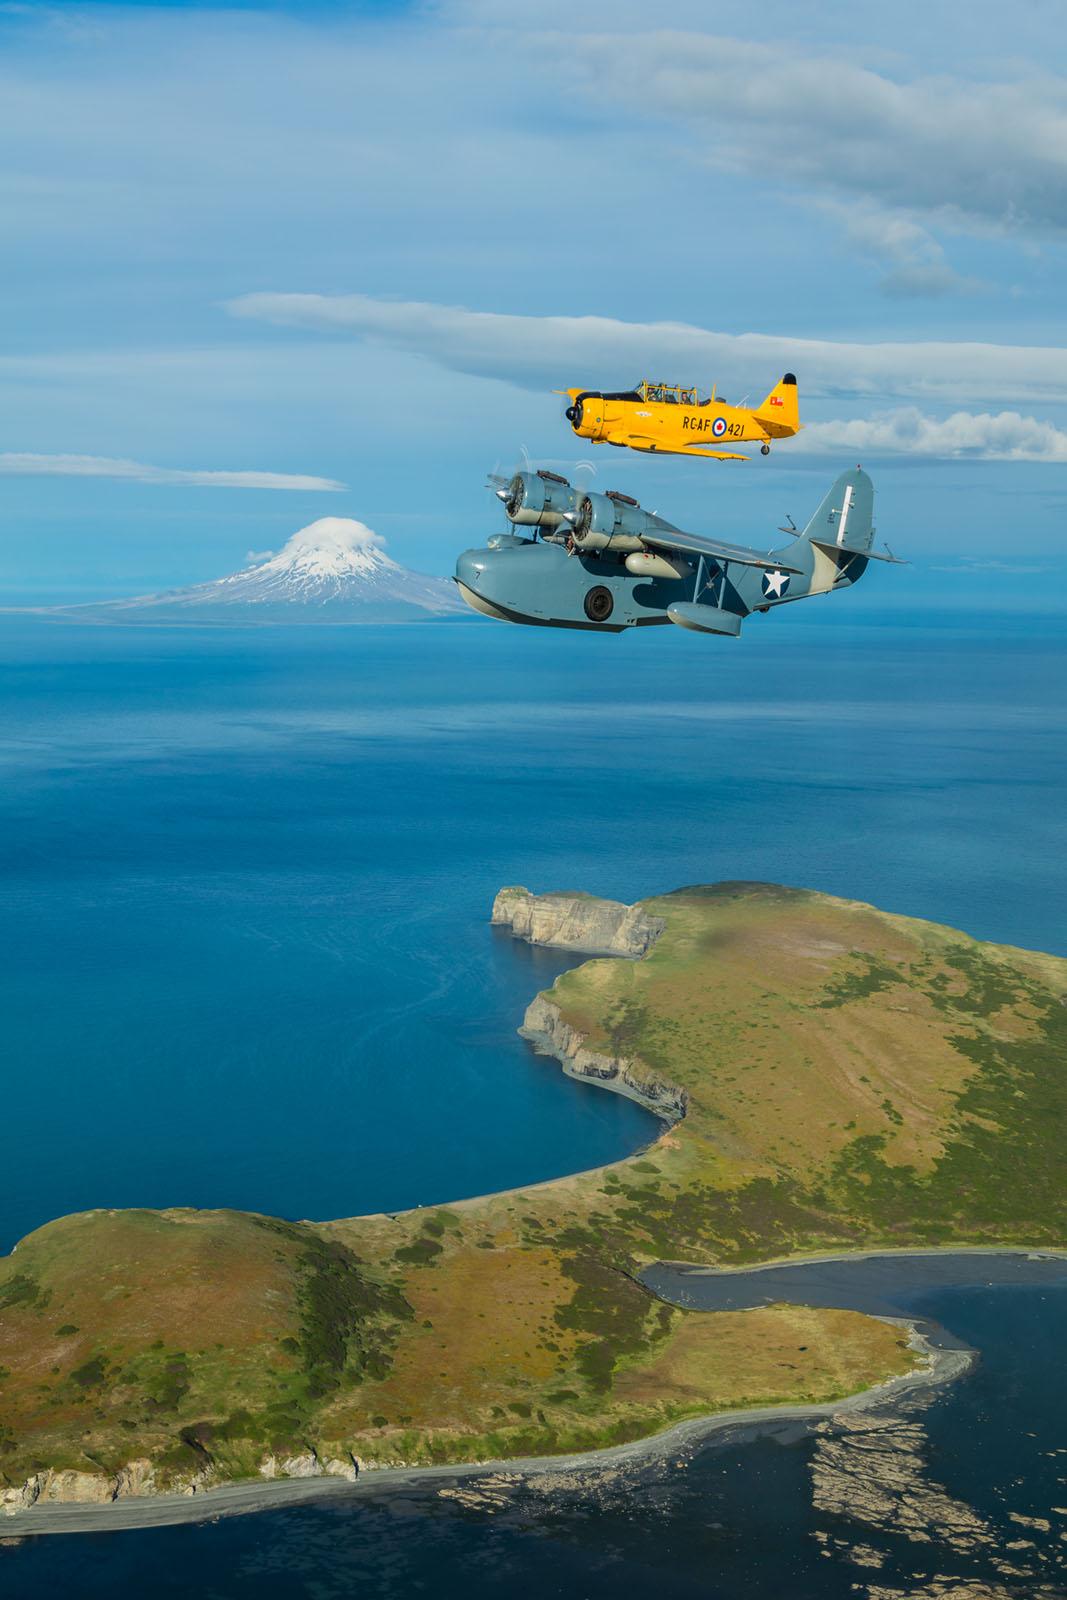 2017, 50mp, 5ds r, Alaska, JRF-5 Grumman Goose, Kenai Peninsula Borough, adventure, aerial, airplanes, alaska wing, art, artist...